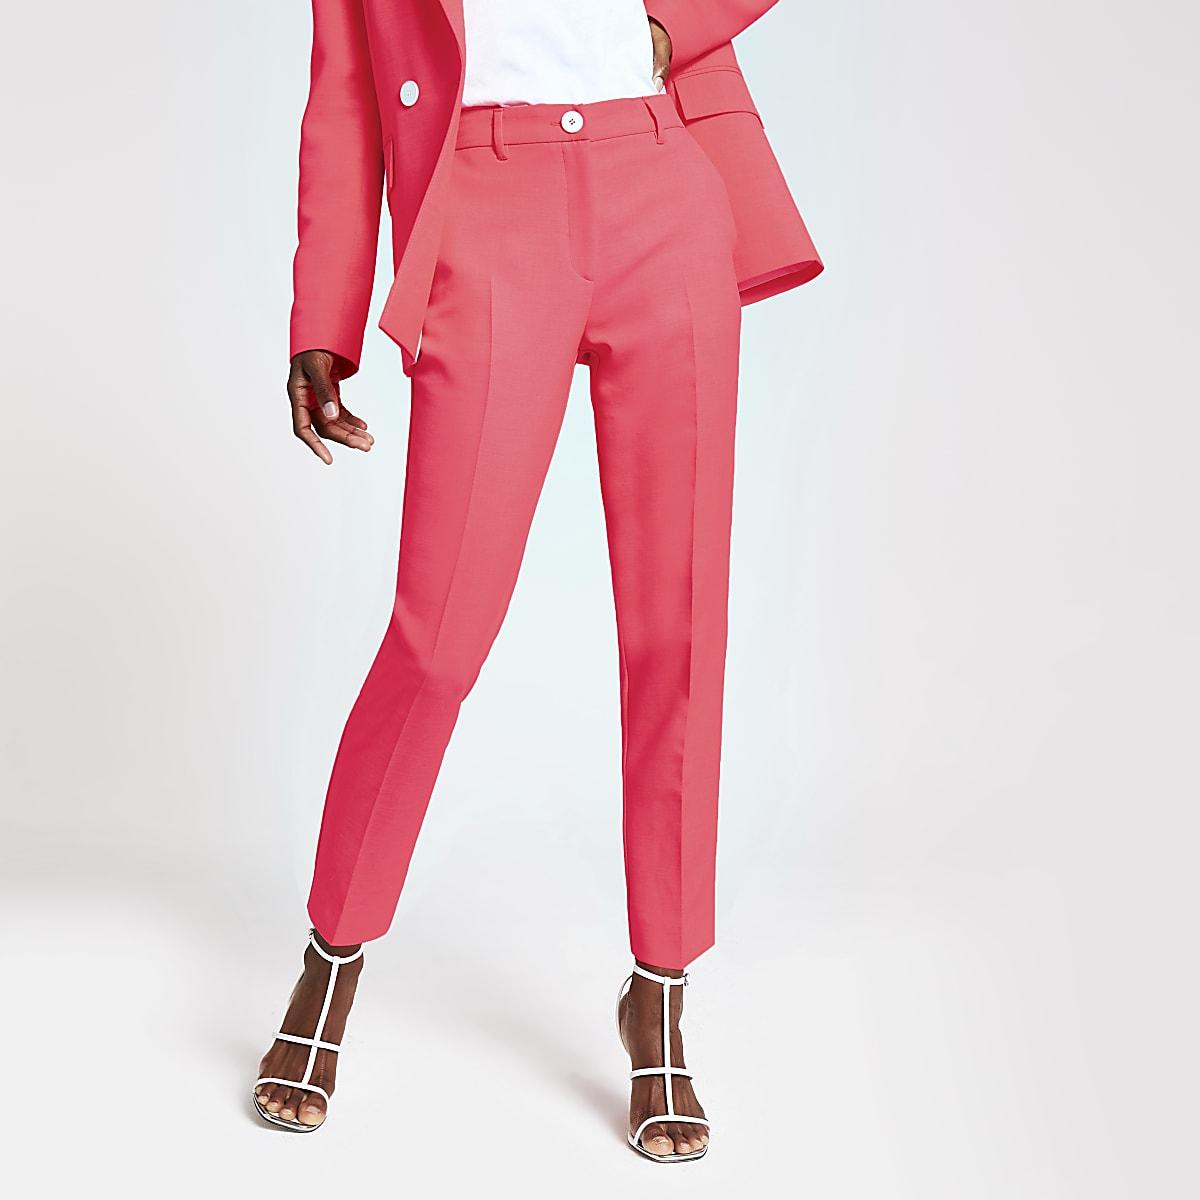 Pantalon cigarette rose fluo